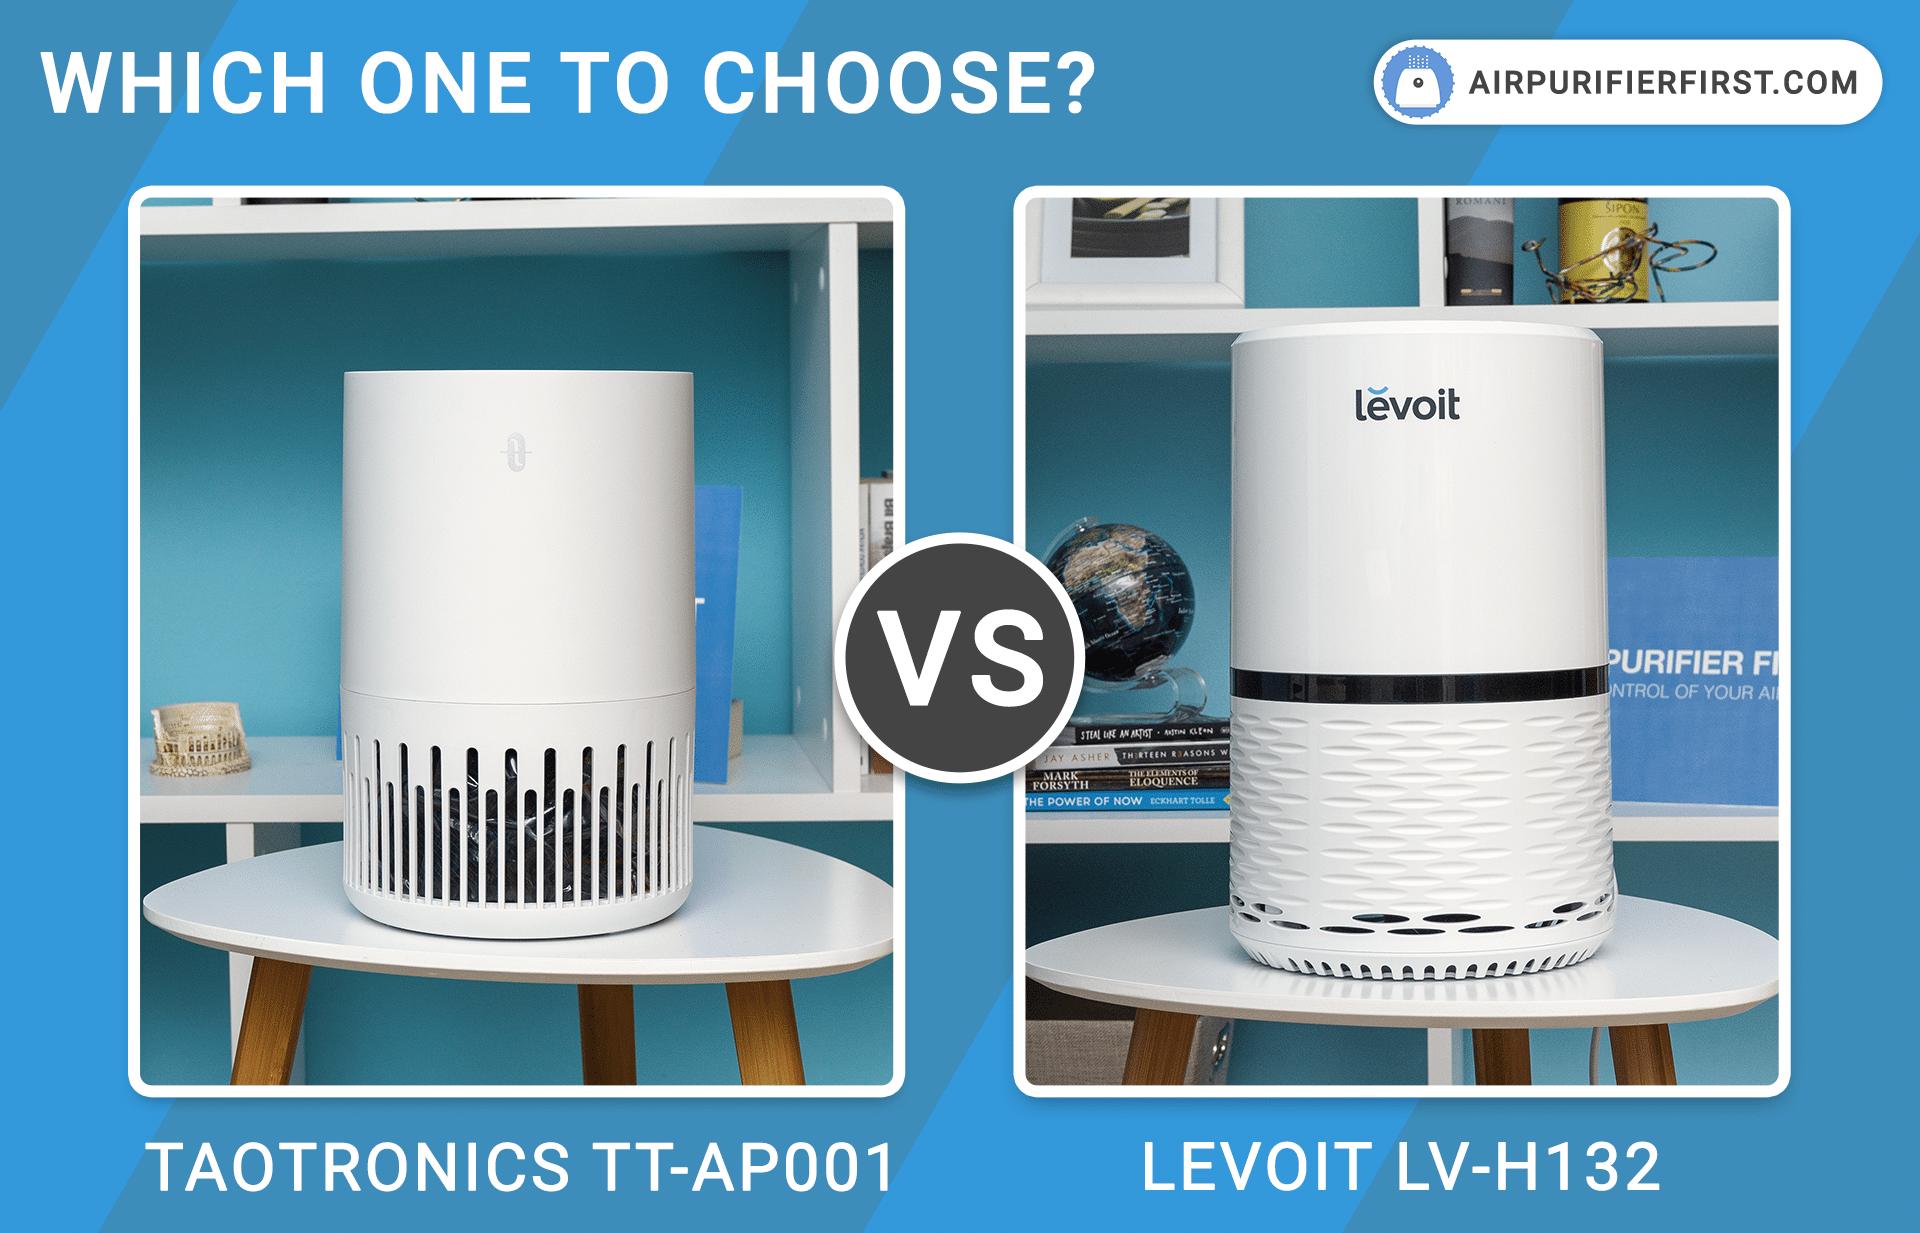 TaoTronics TT-AP001 Vs Levoit LV-H132 - Comparison